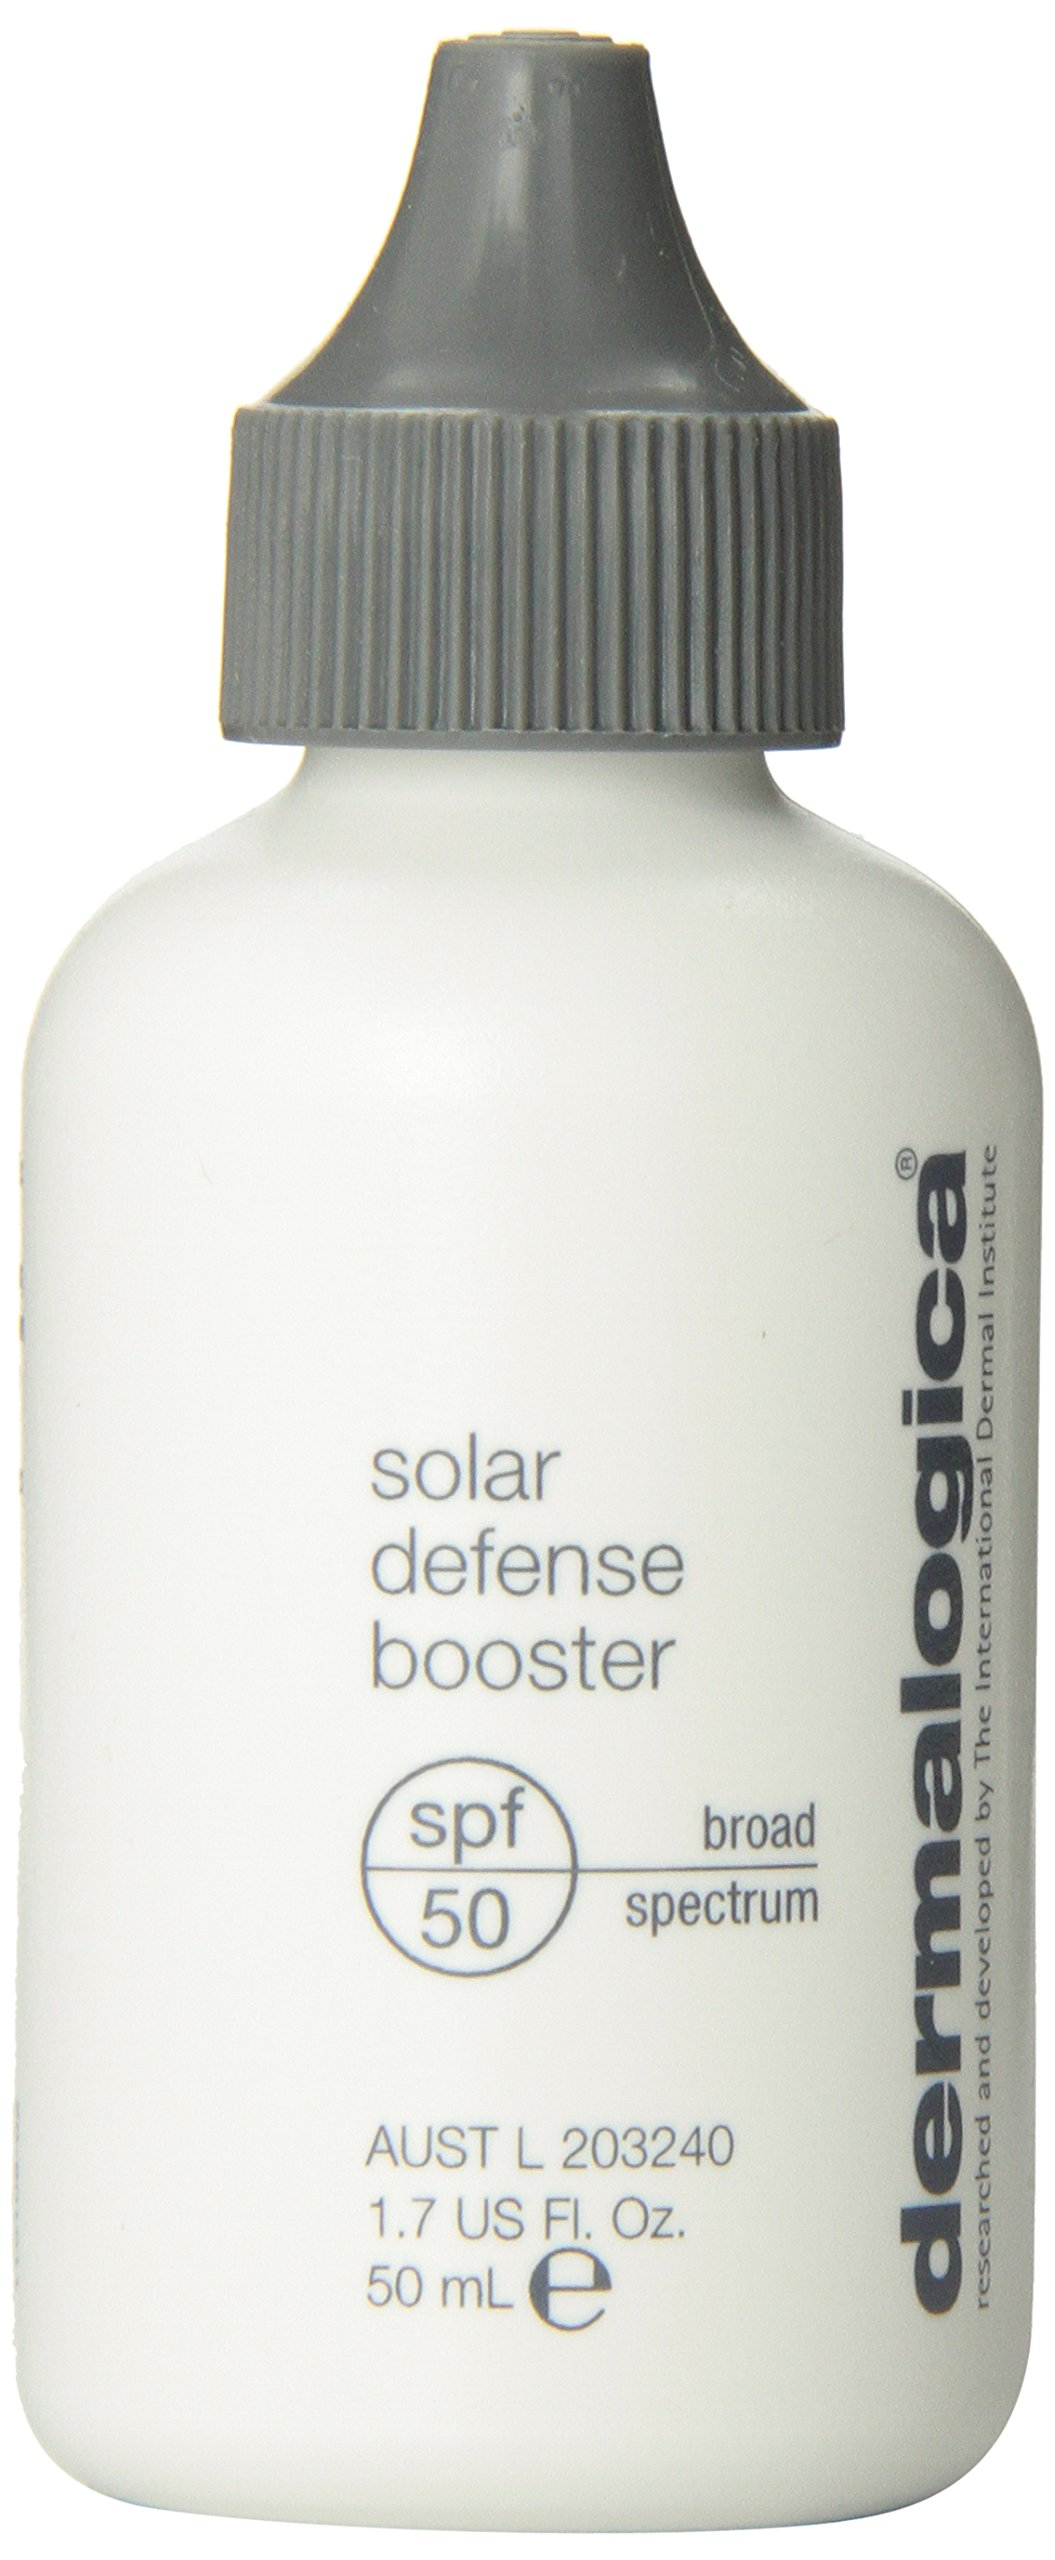 Dermalogica Solar Defense Booster SPF 50, 1.7 Ounce